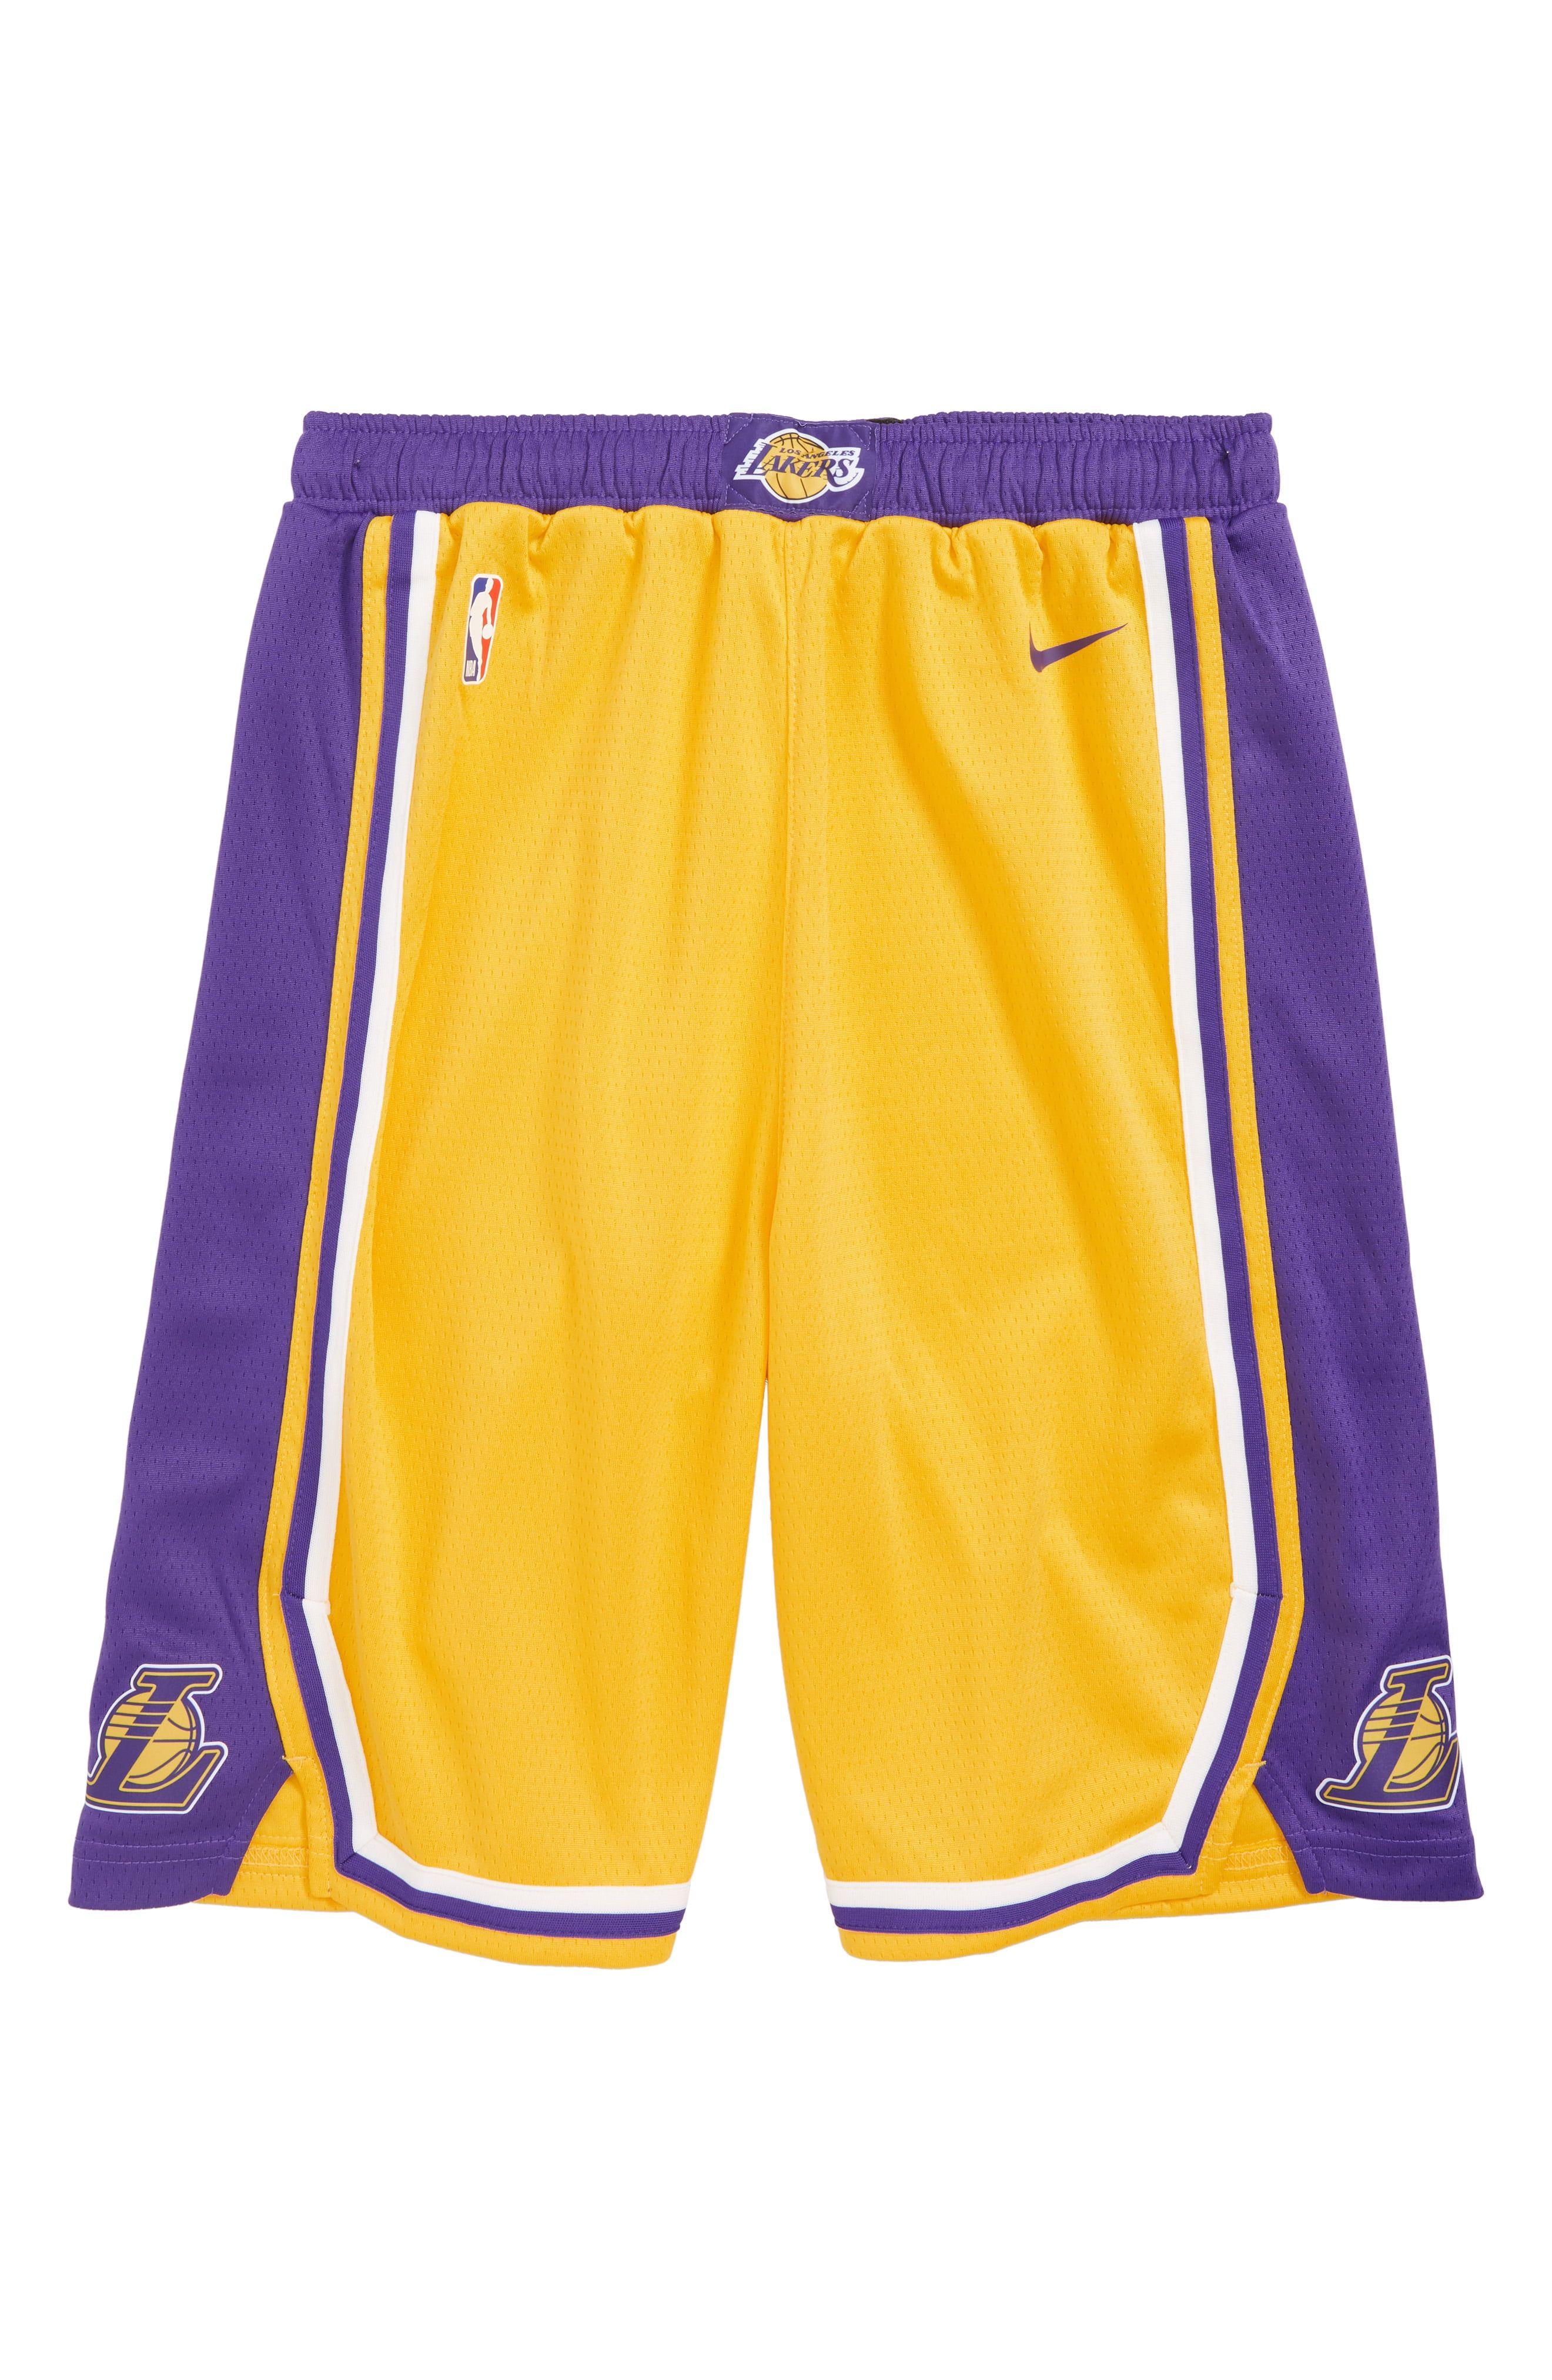 Boy S Nike Icon Los Angeles Lakers Basketball Shorts Size L 14 16 Metallic Los Angeles Lakers Basketball Basketball Shorts Lakers Basketball